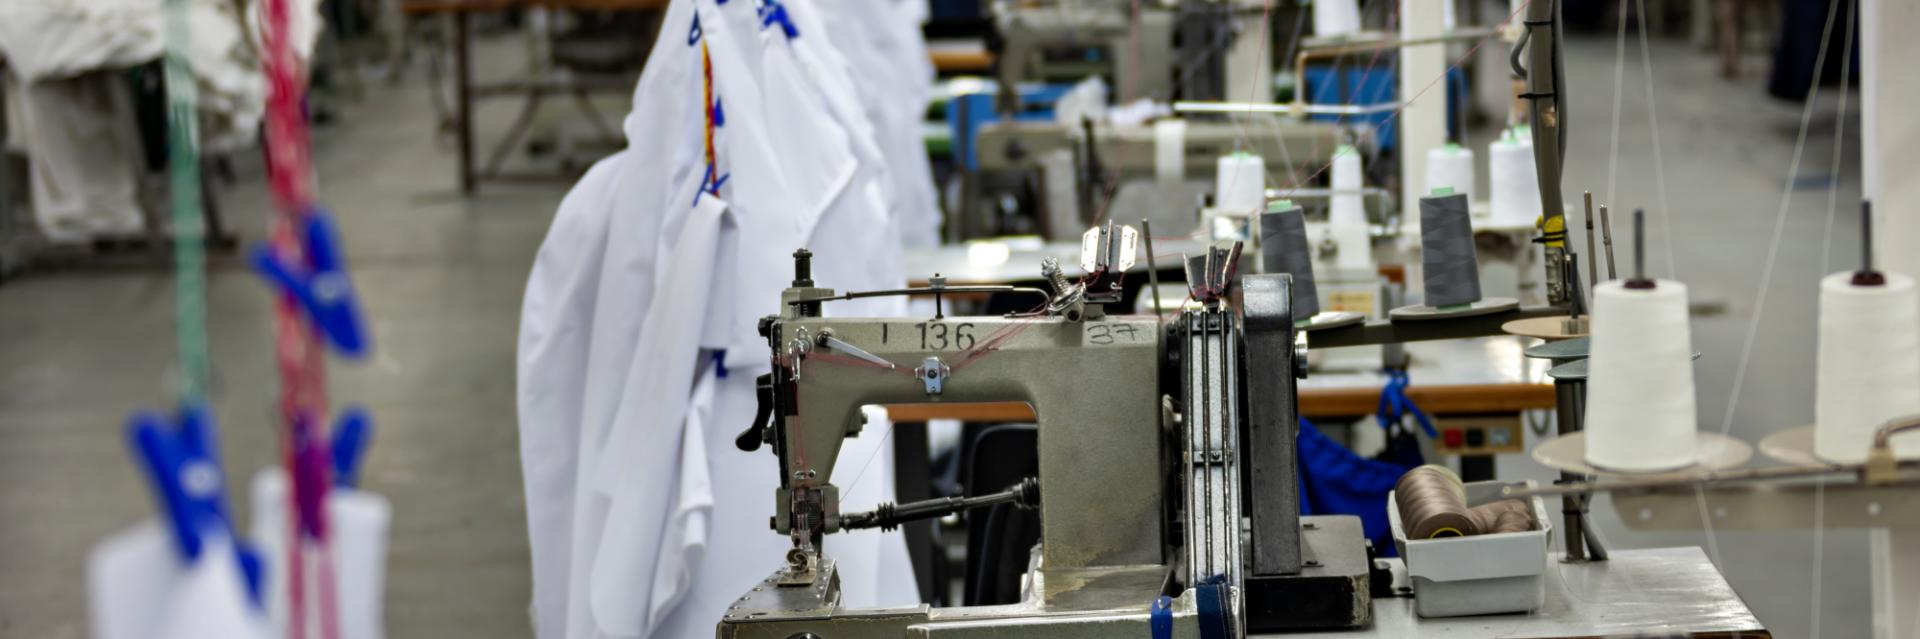 Rwanda prepares for the start of trading under the AfCFTA